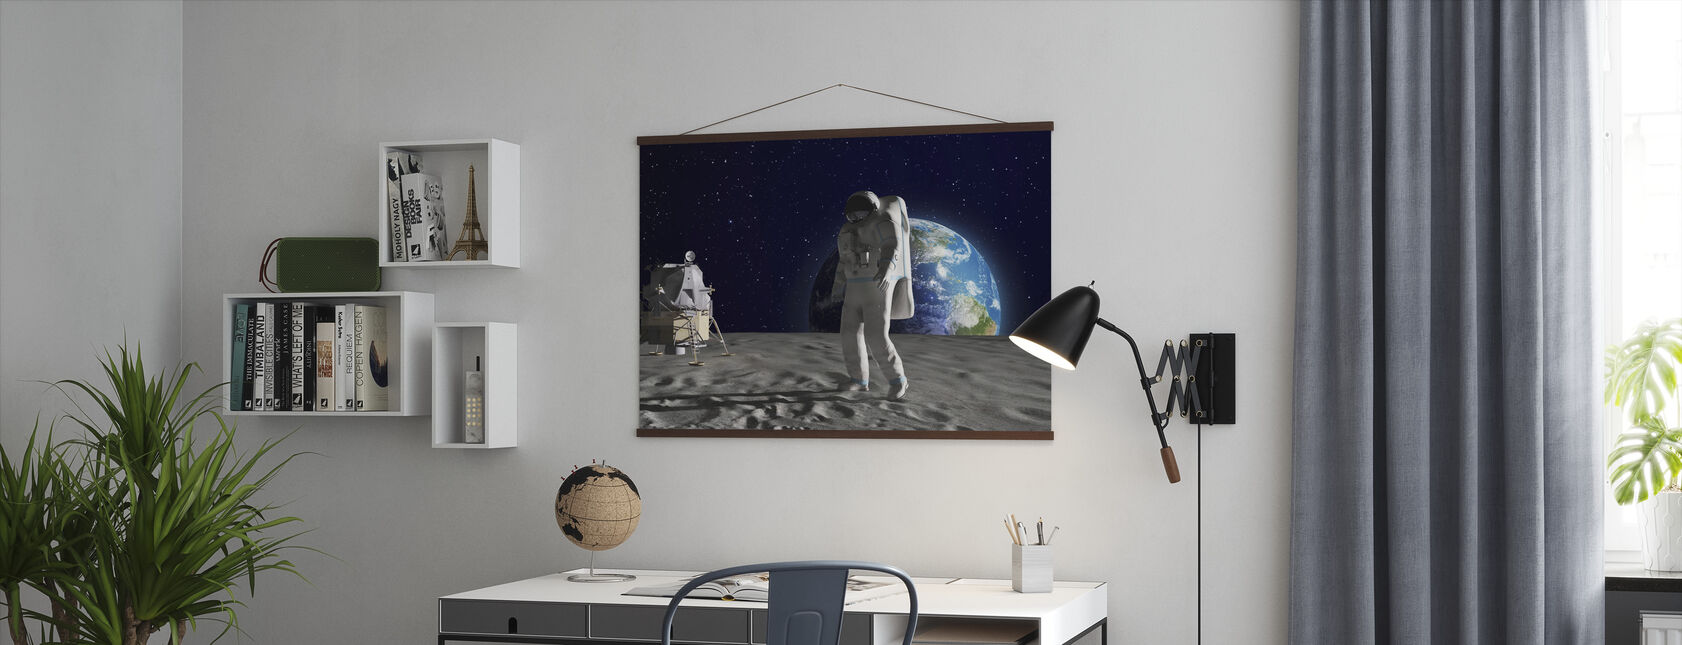 Astronaut on the Moon - Poster - Office